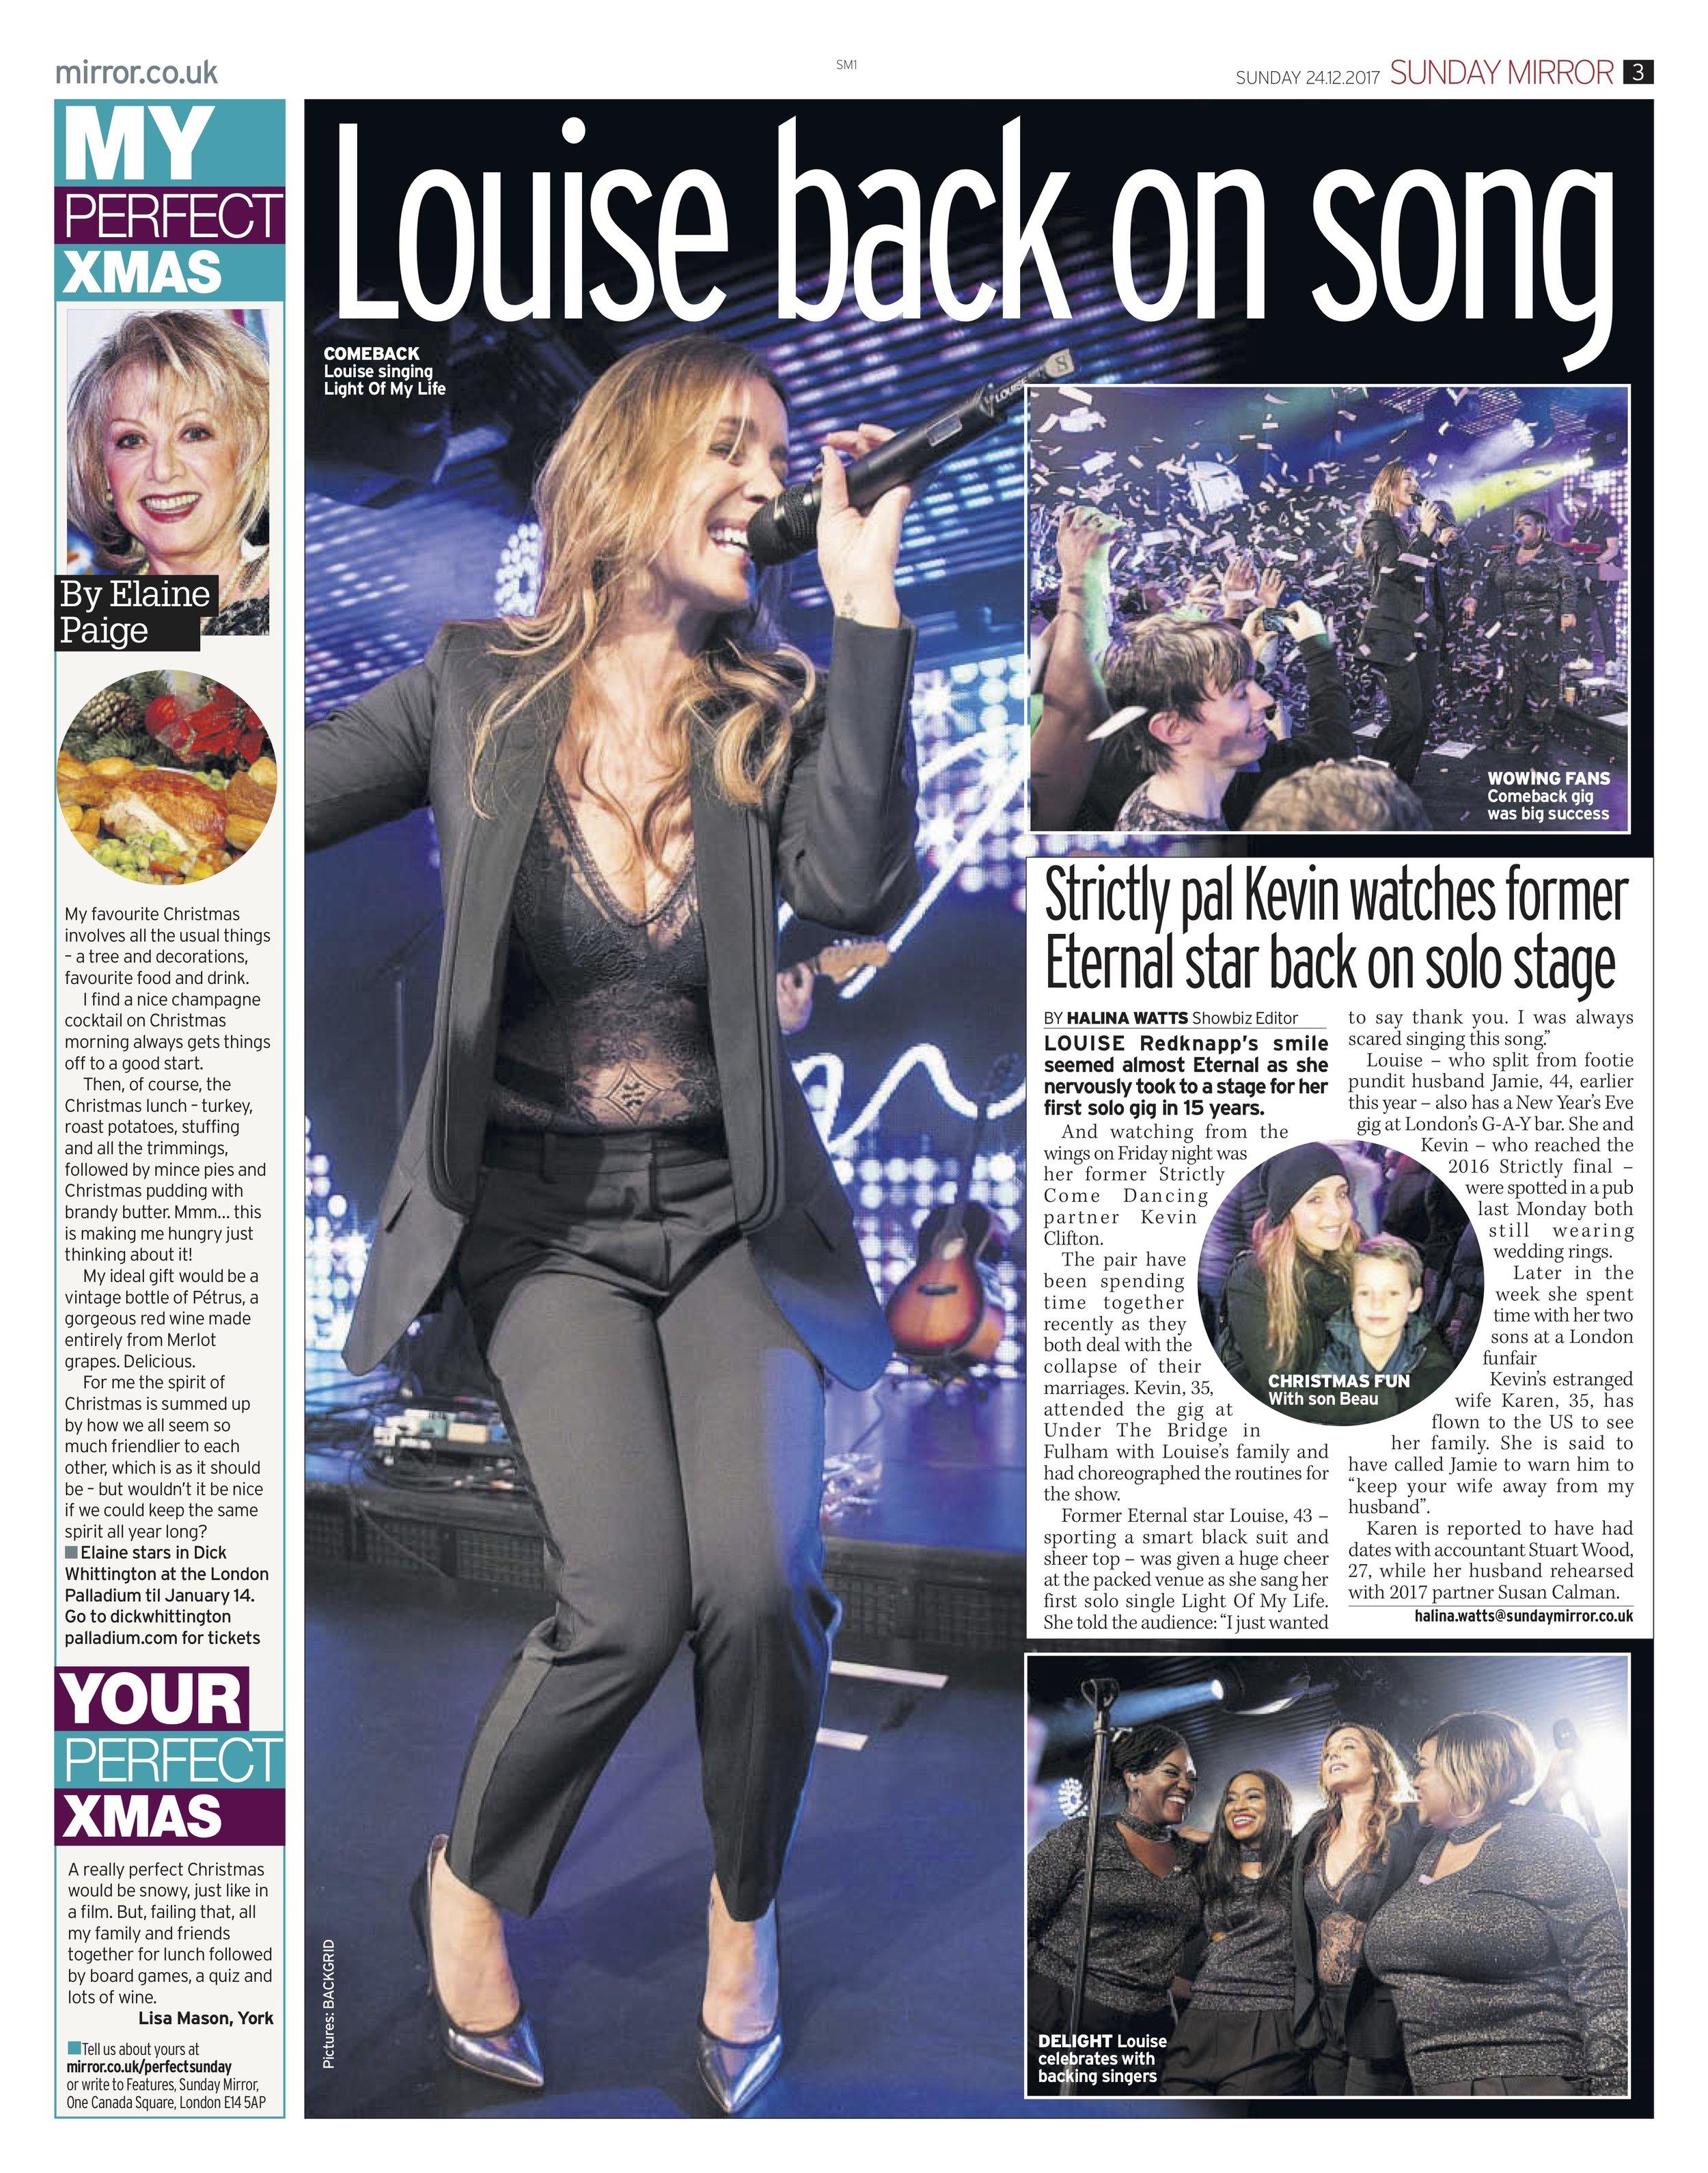 Louise Redknapp / Sunday Mirror